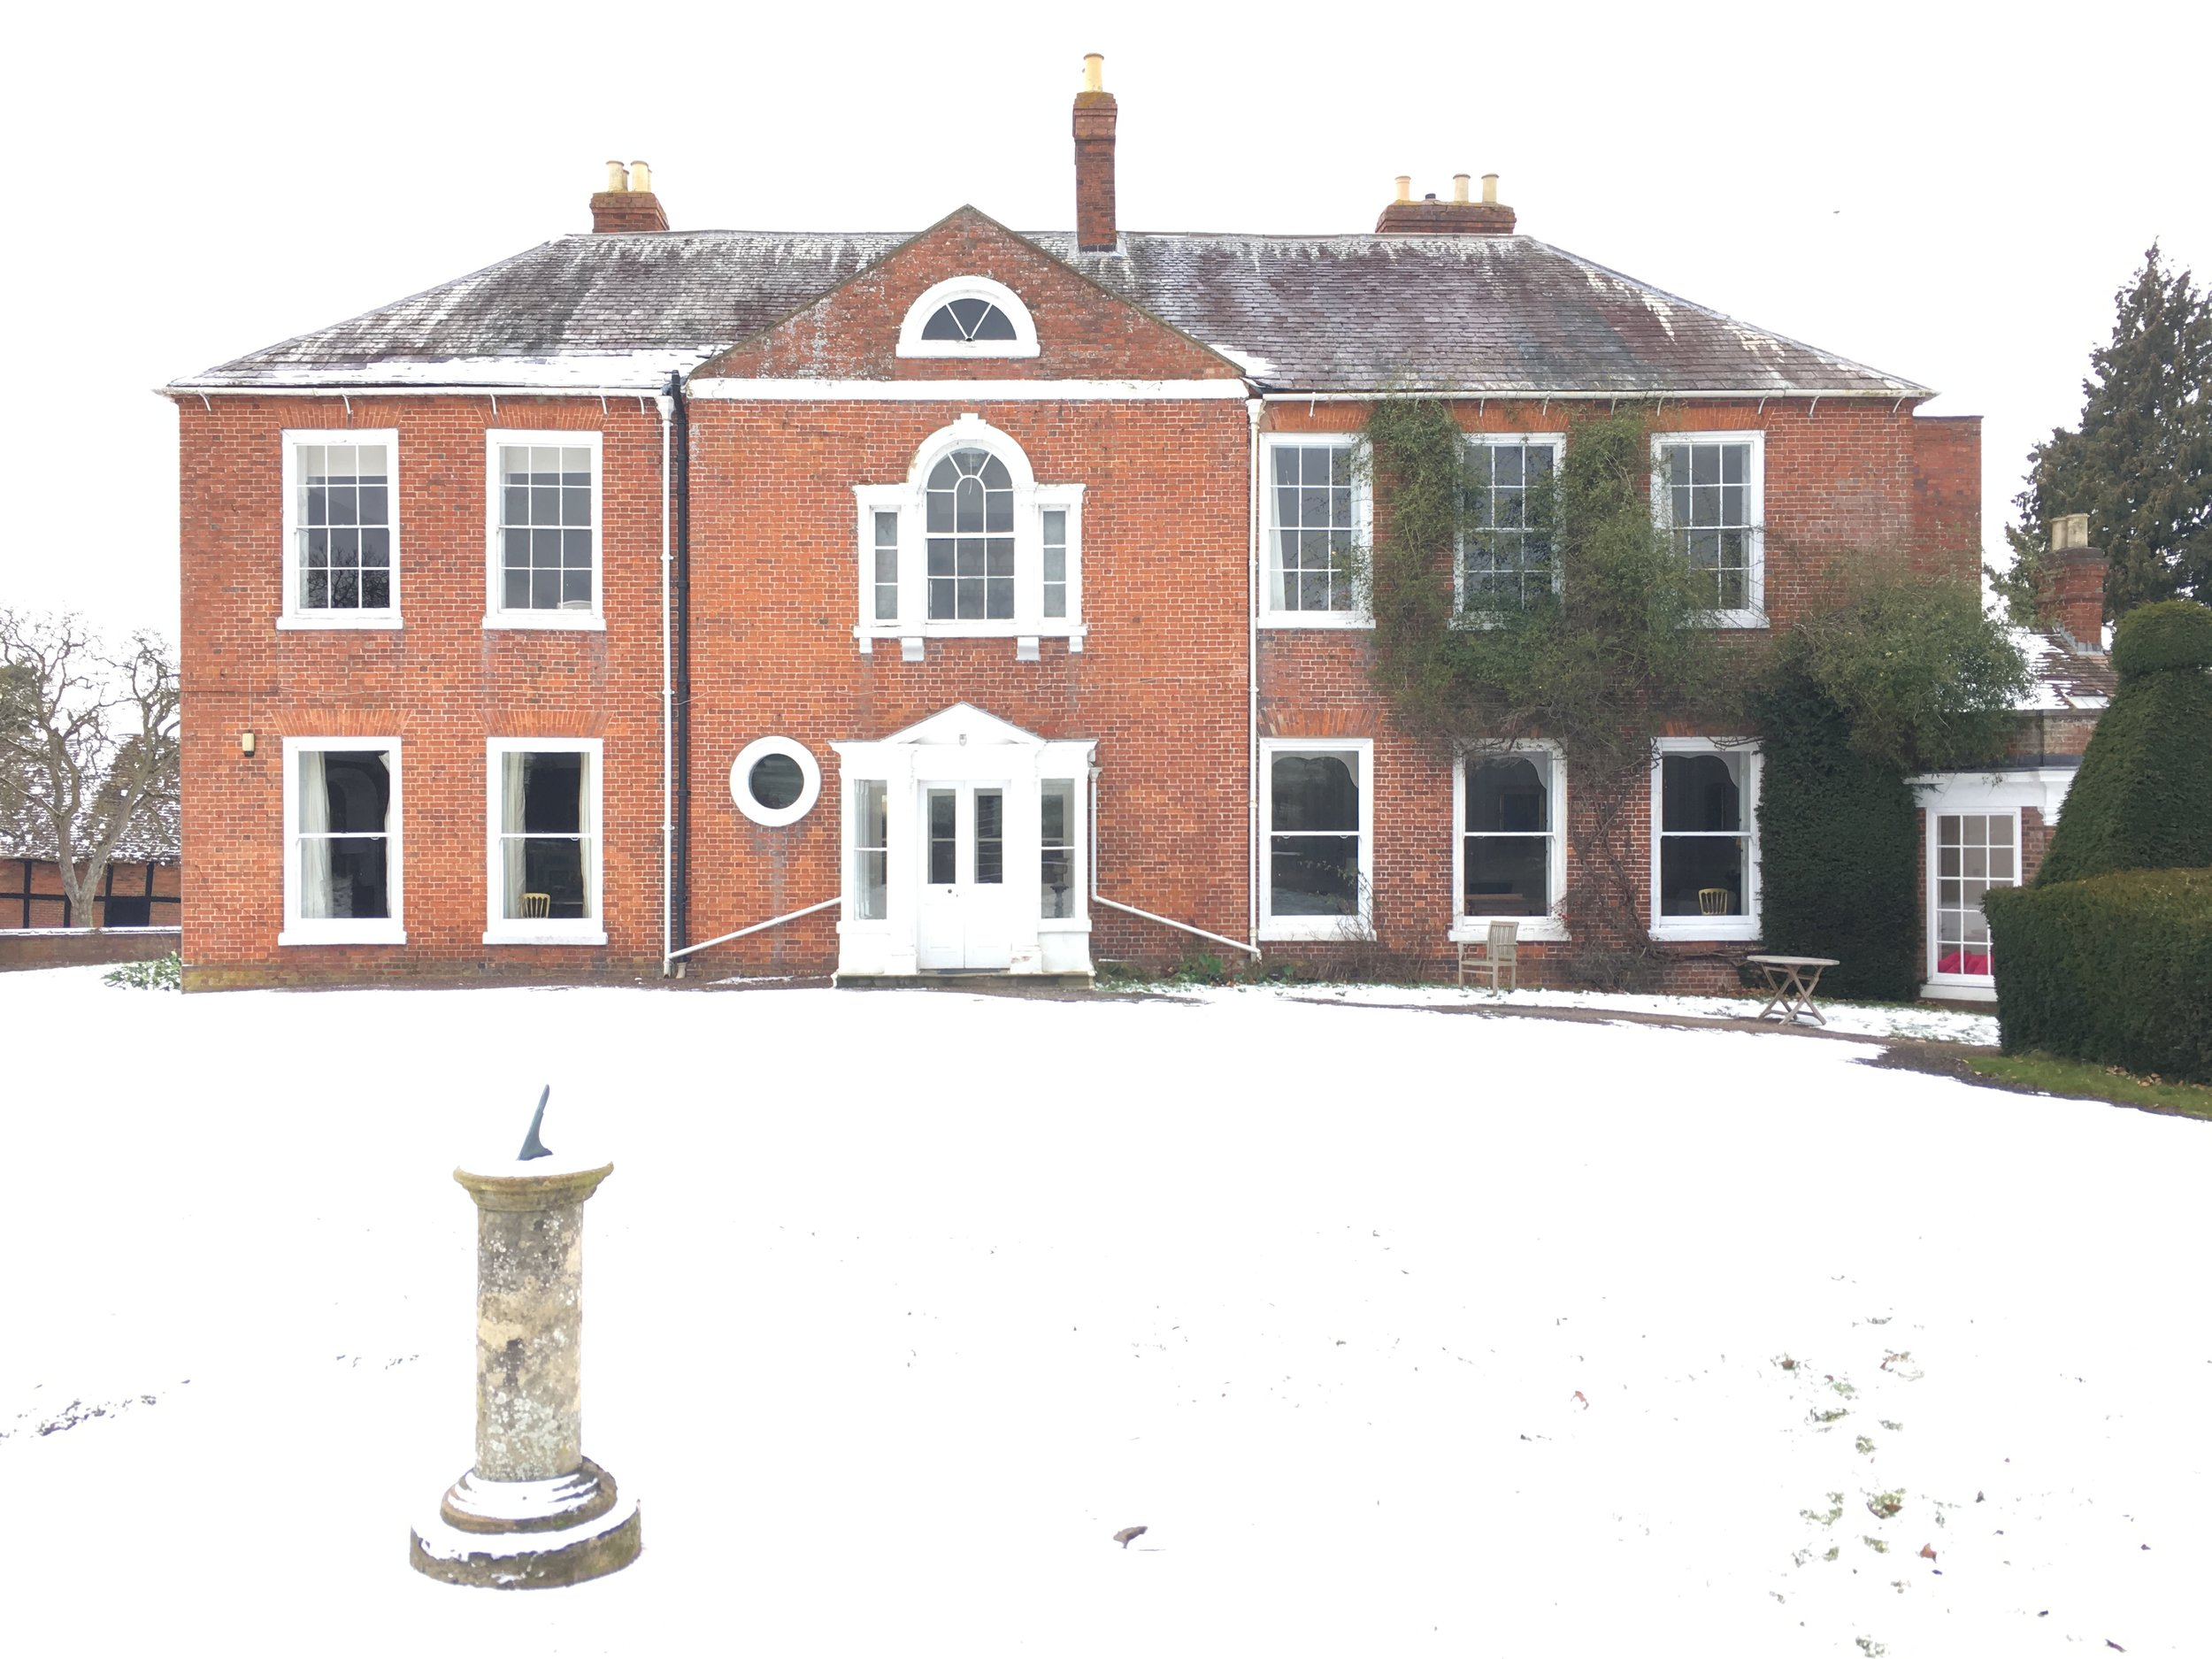 BARTON COURT IN THE SNOW.JPG